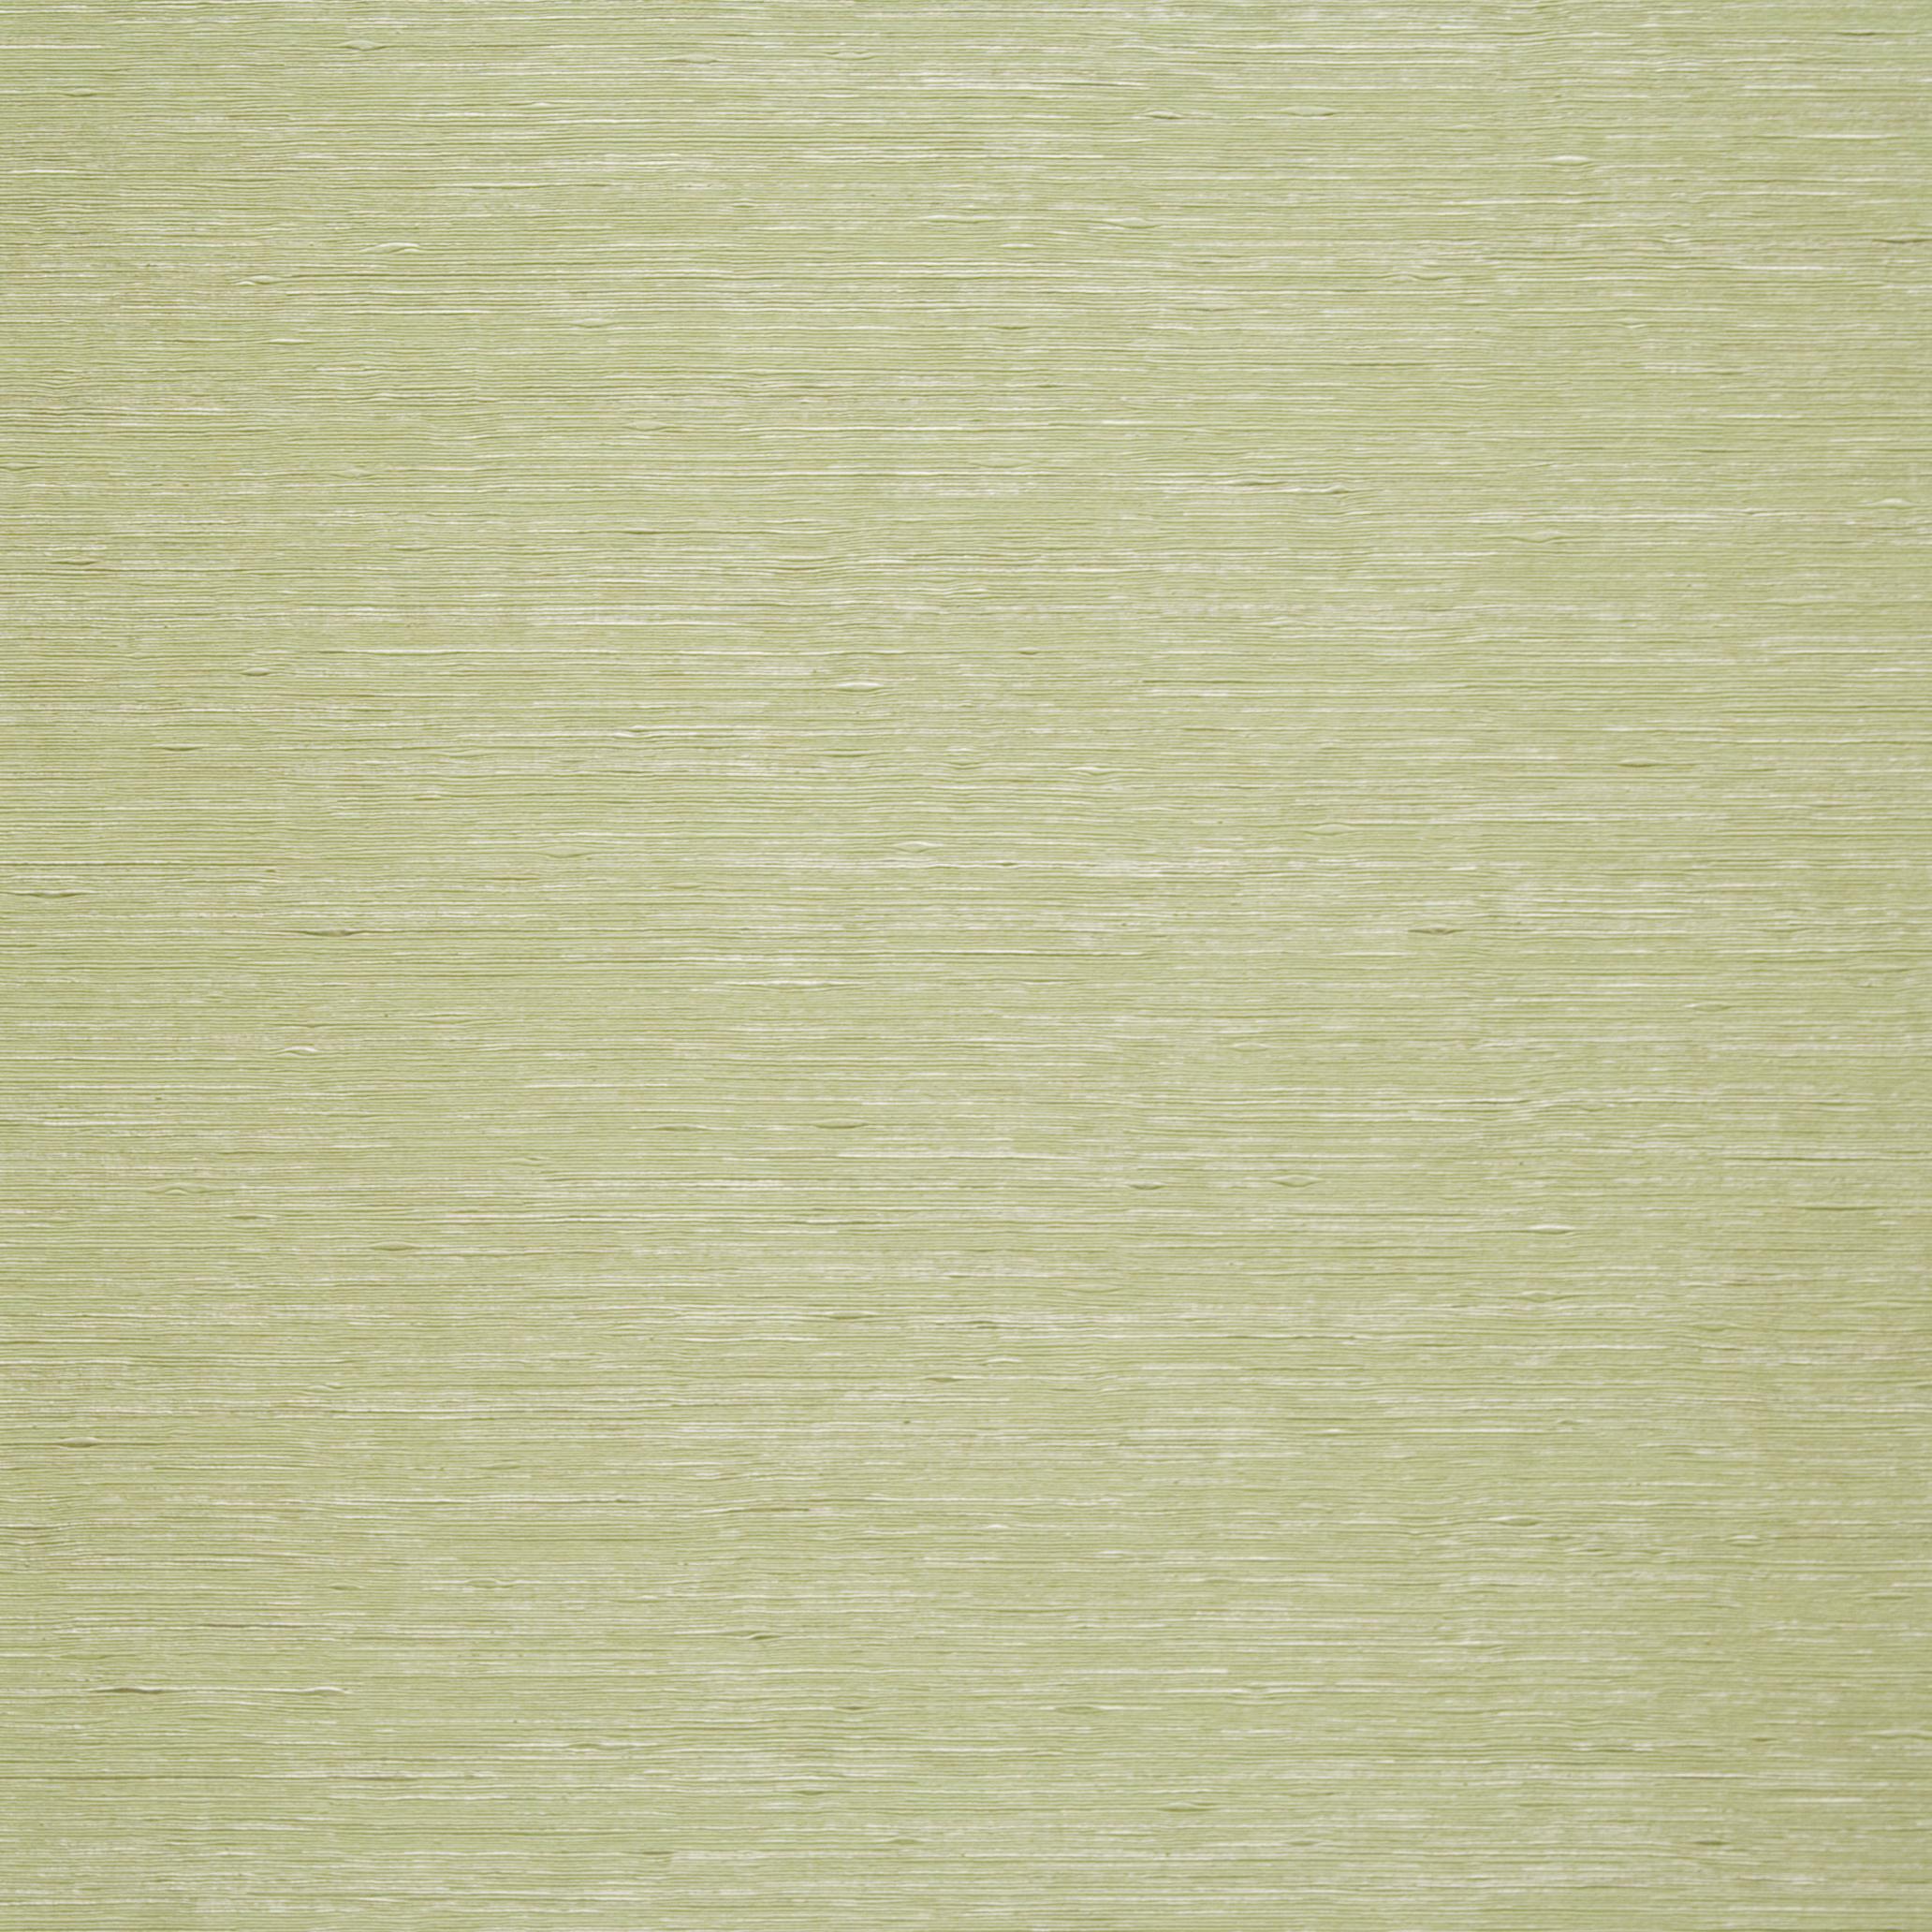 Обои  BN International,  коллекция Colour Line, артикул49465